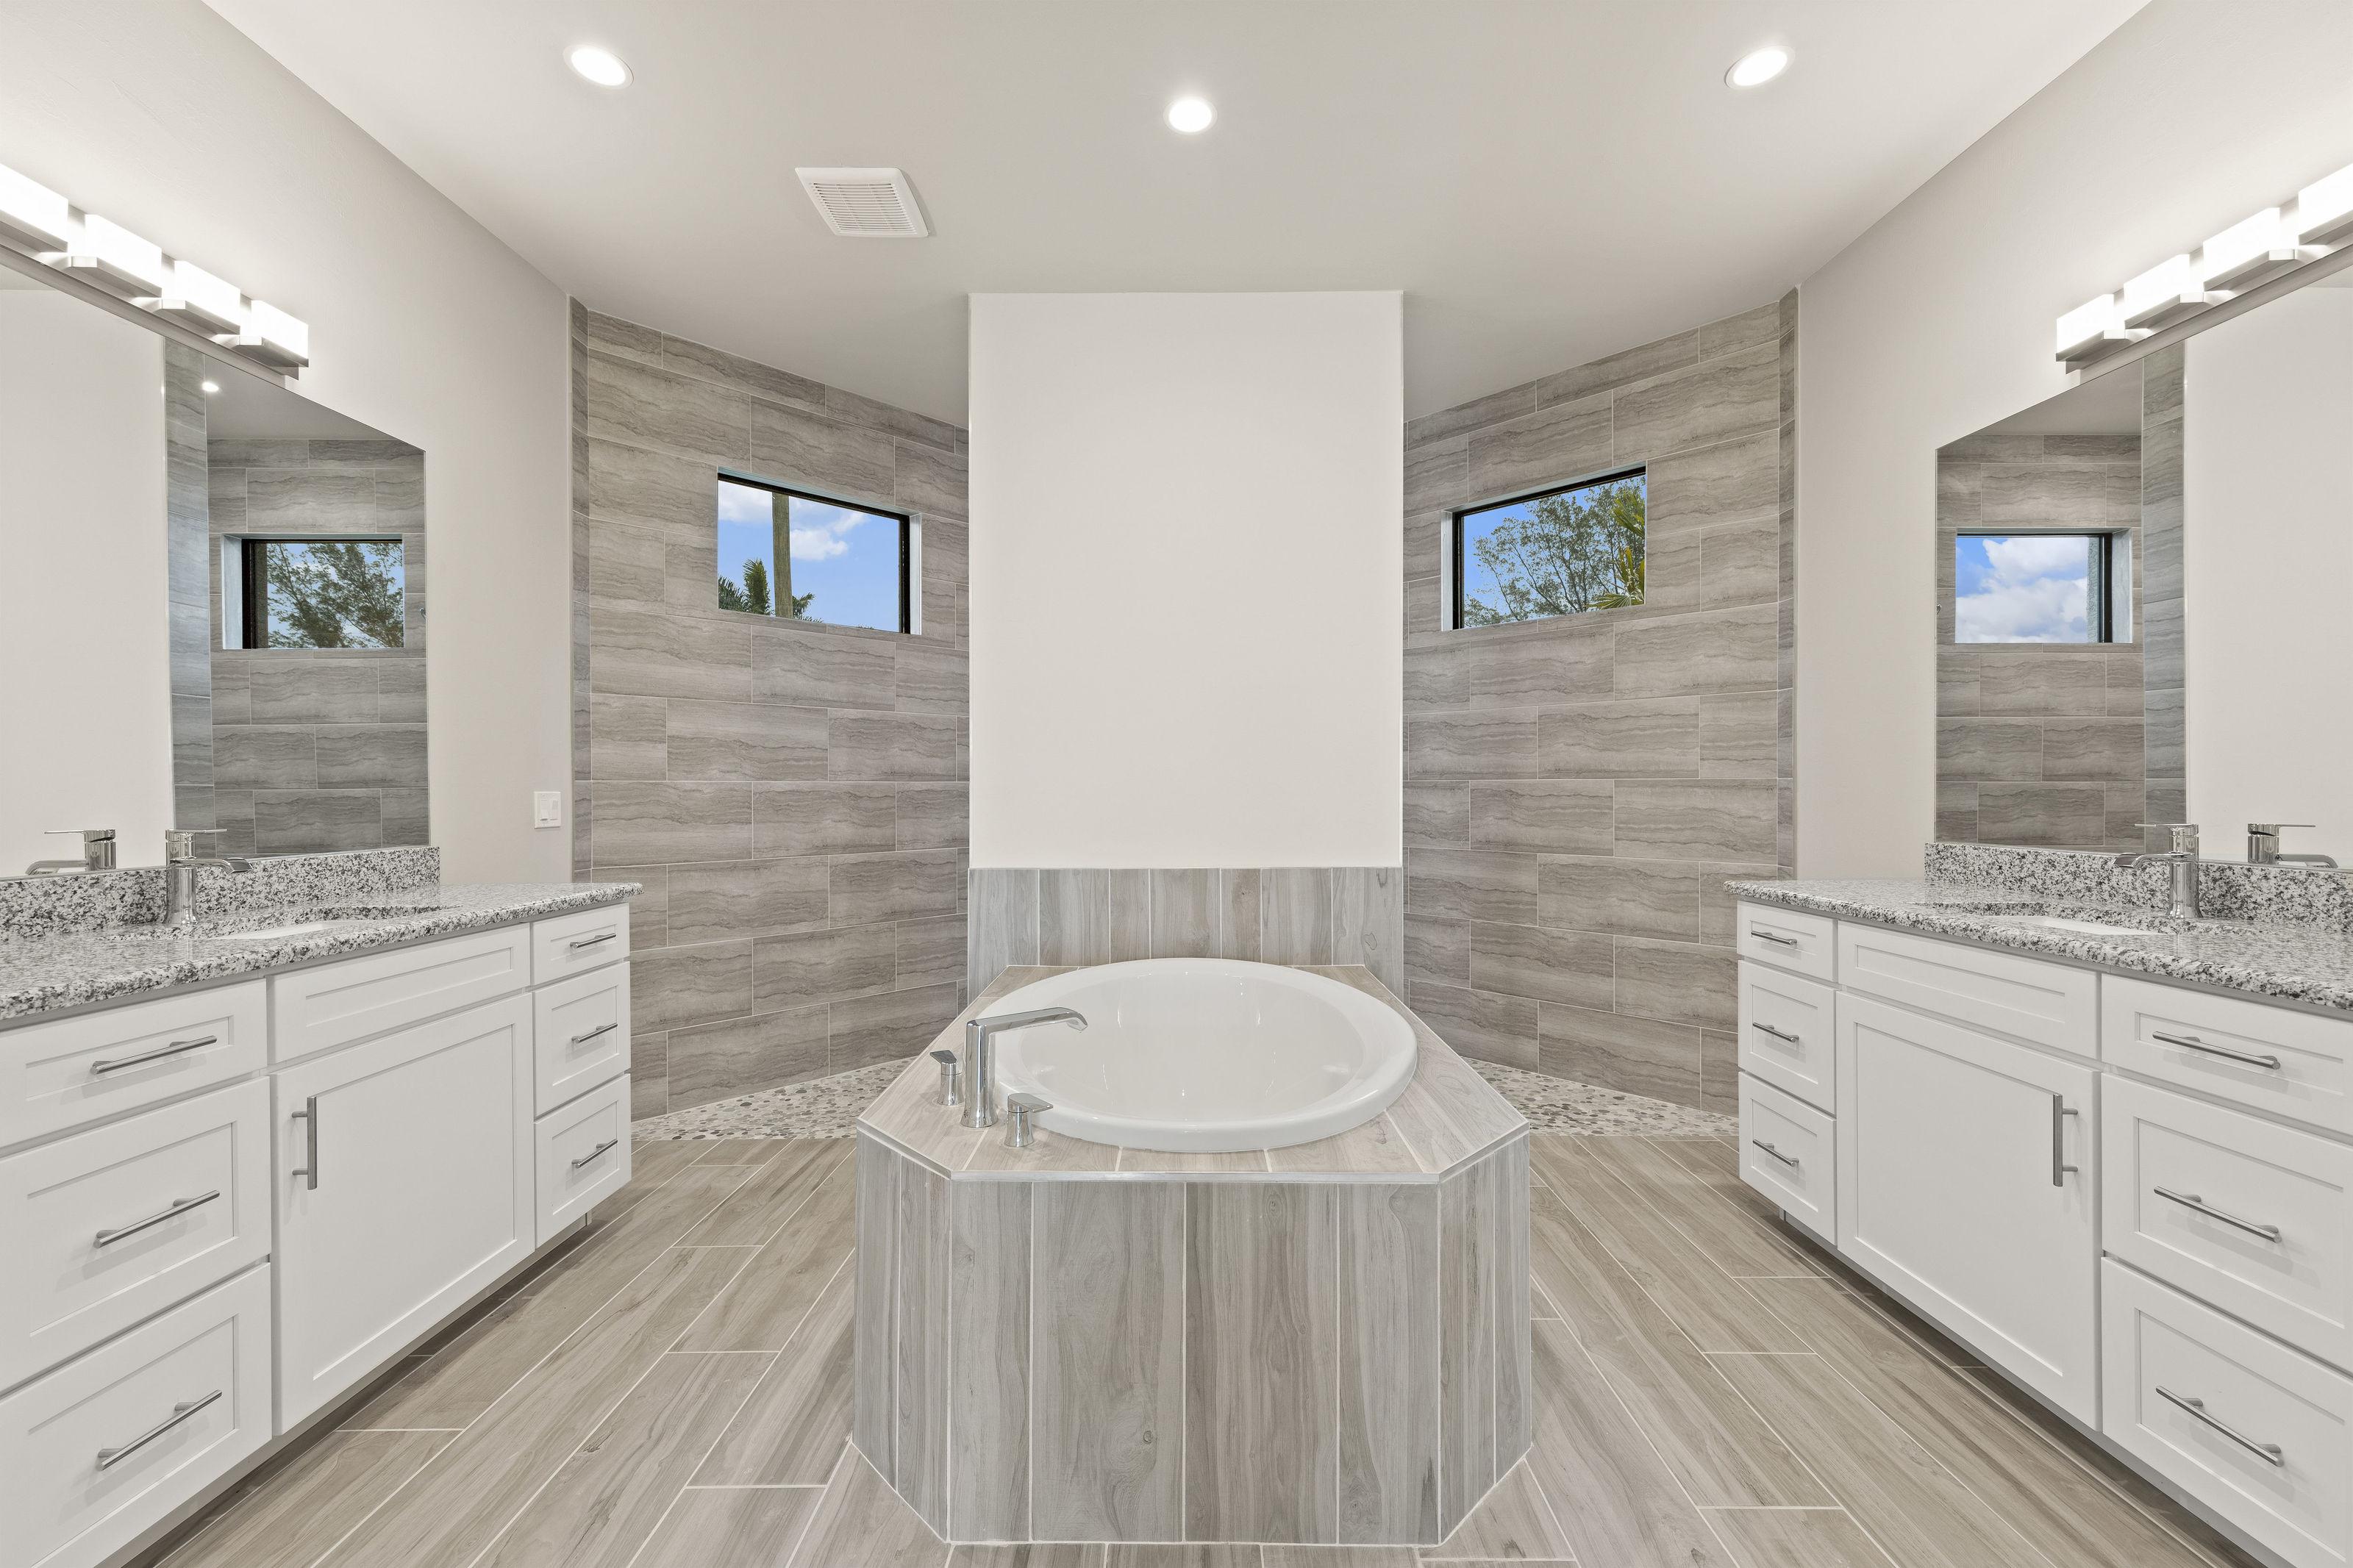 017_master_bathroom_1_of_3